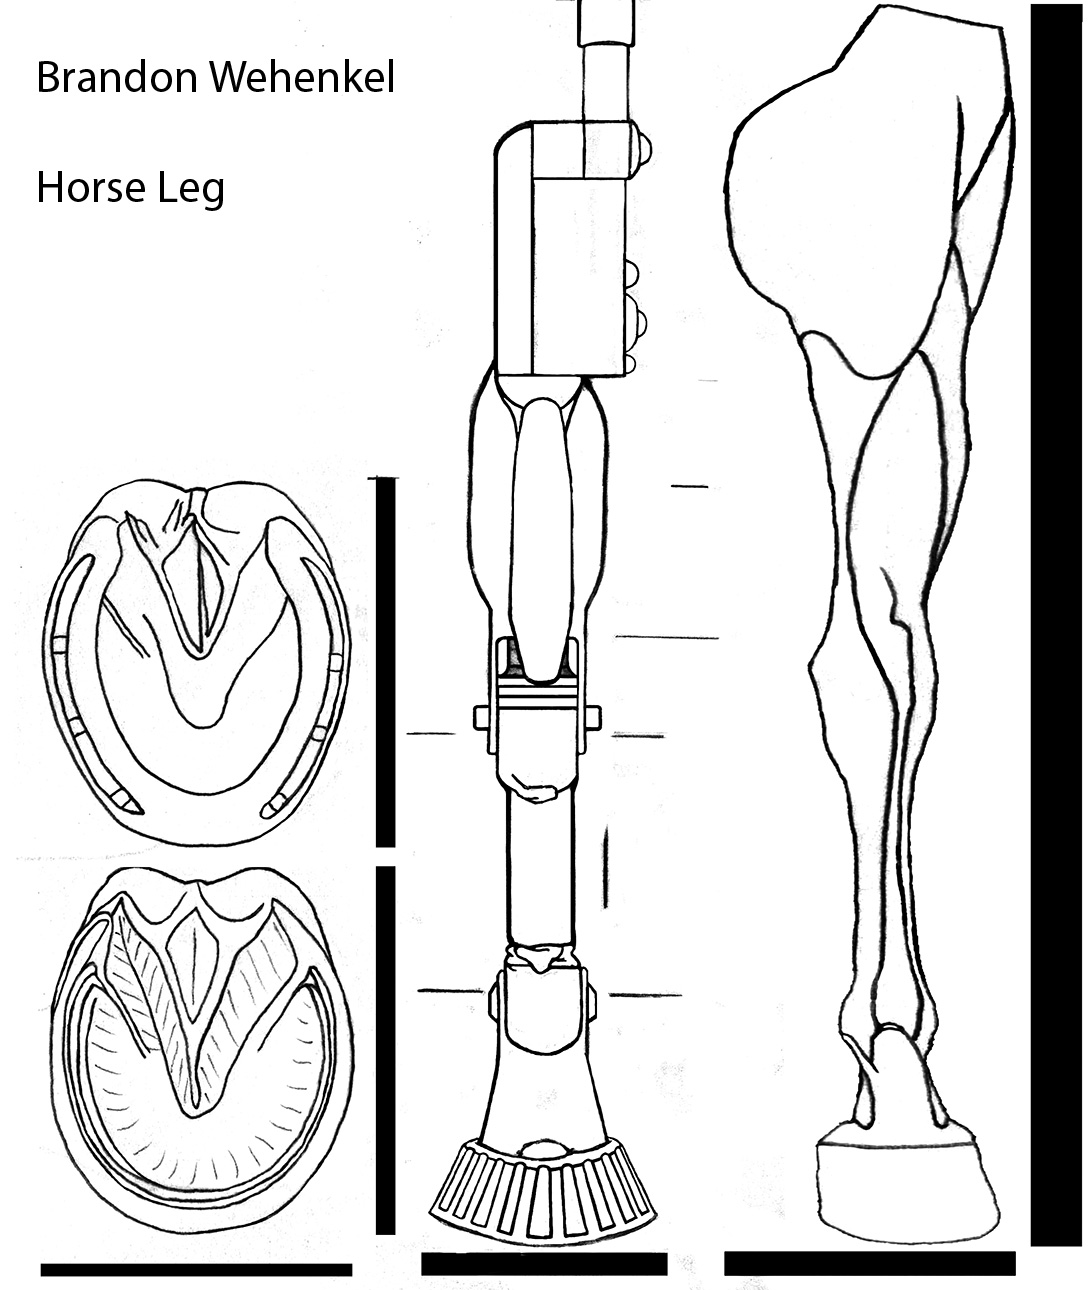 Prosthesis Horse Leg Anatomy Diagram - Application Wiring Diagram •